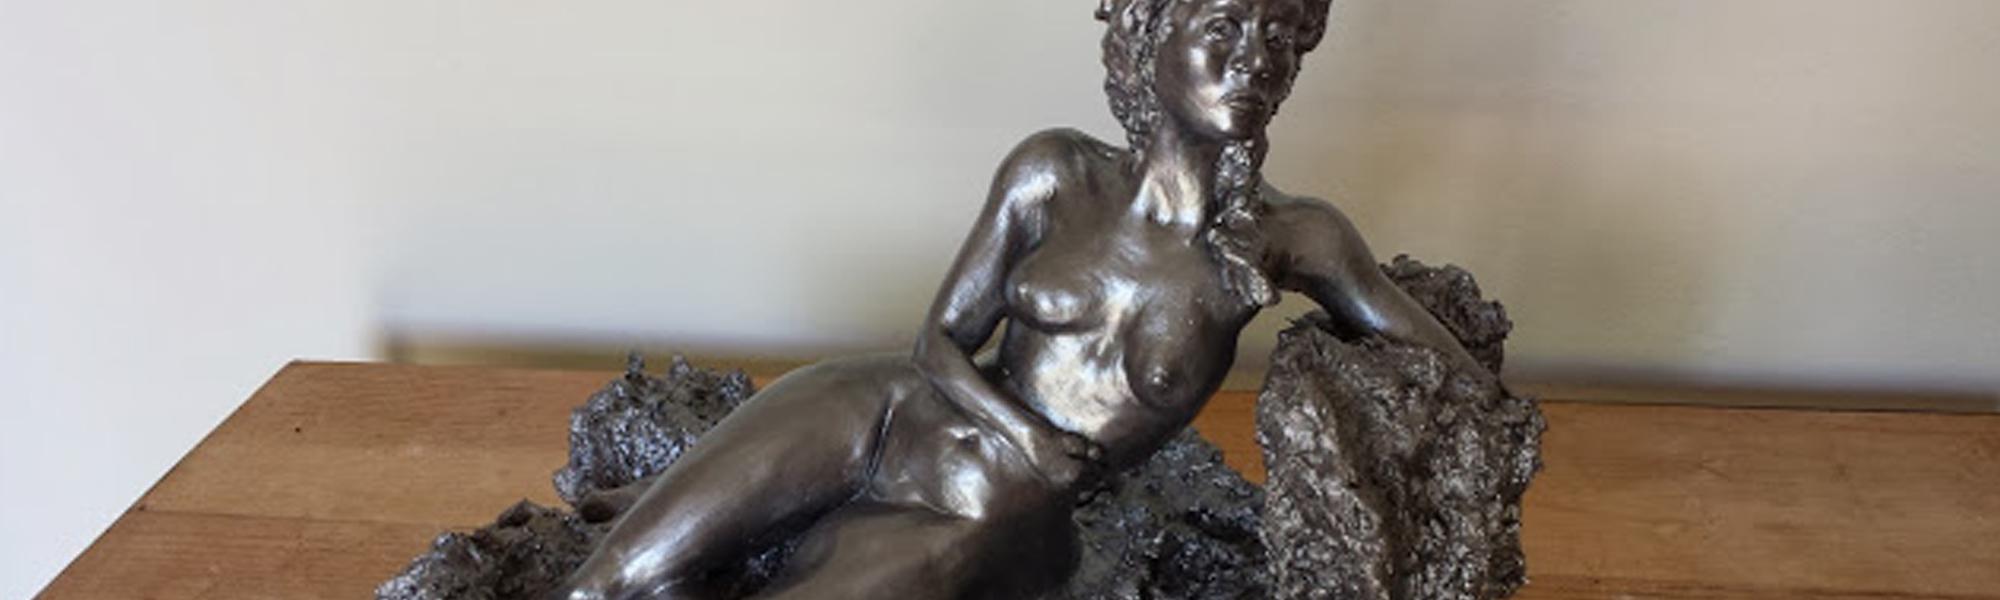 sculpth2